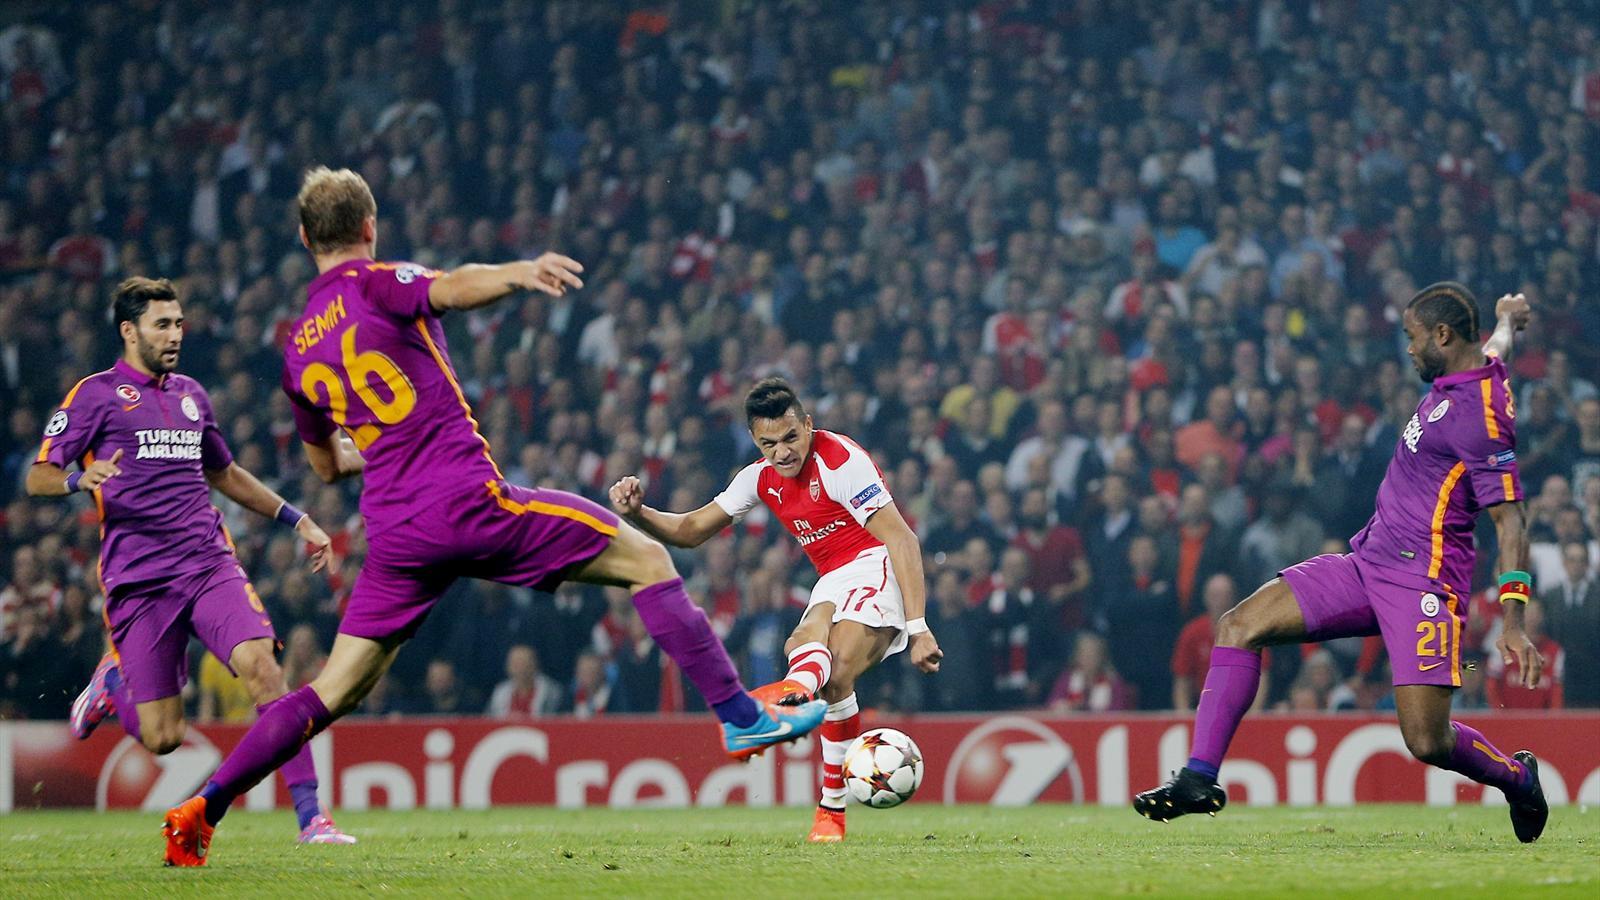 Galatasaray - Arsenal maçının muhtemel kadroları